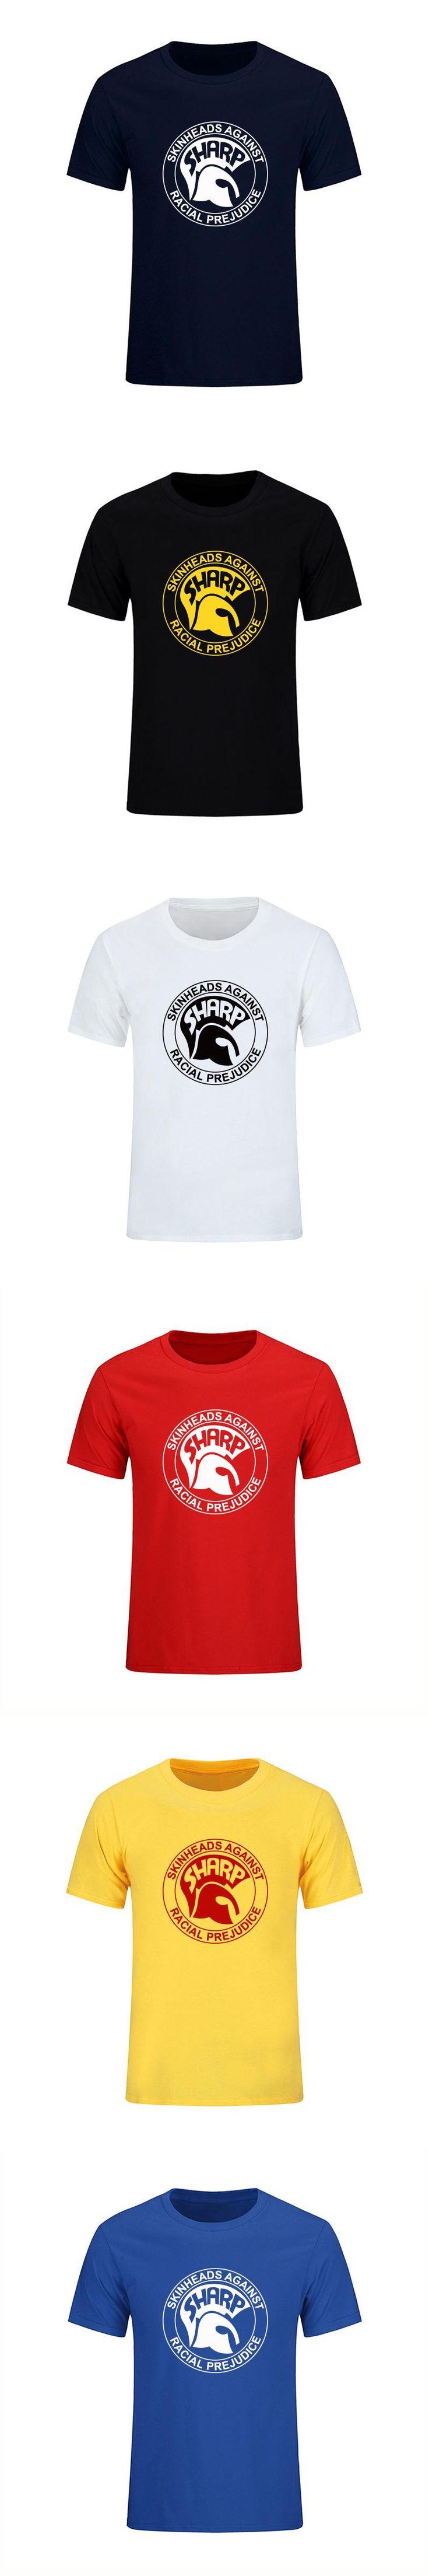 2017 New Skinhead Logo Printed Men Cotton T Shirt Hip Hos Short Sleeve Tops Tees Casual Male Jumper Clothing Camisetas Masculina